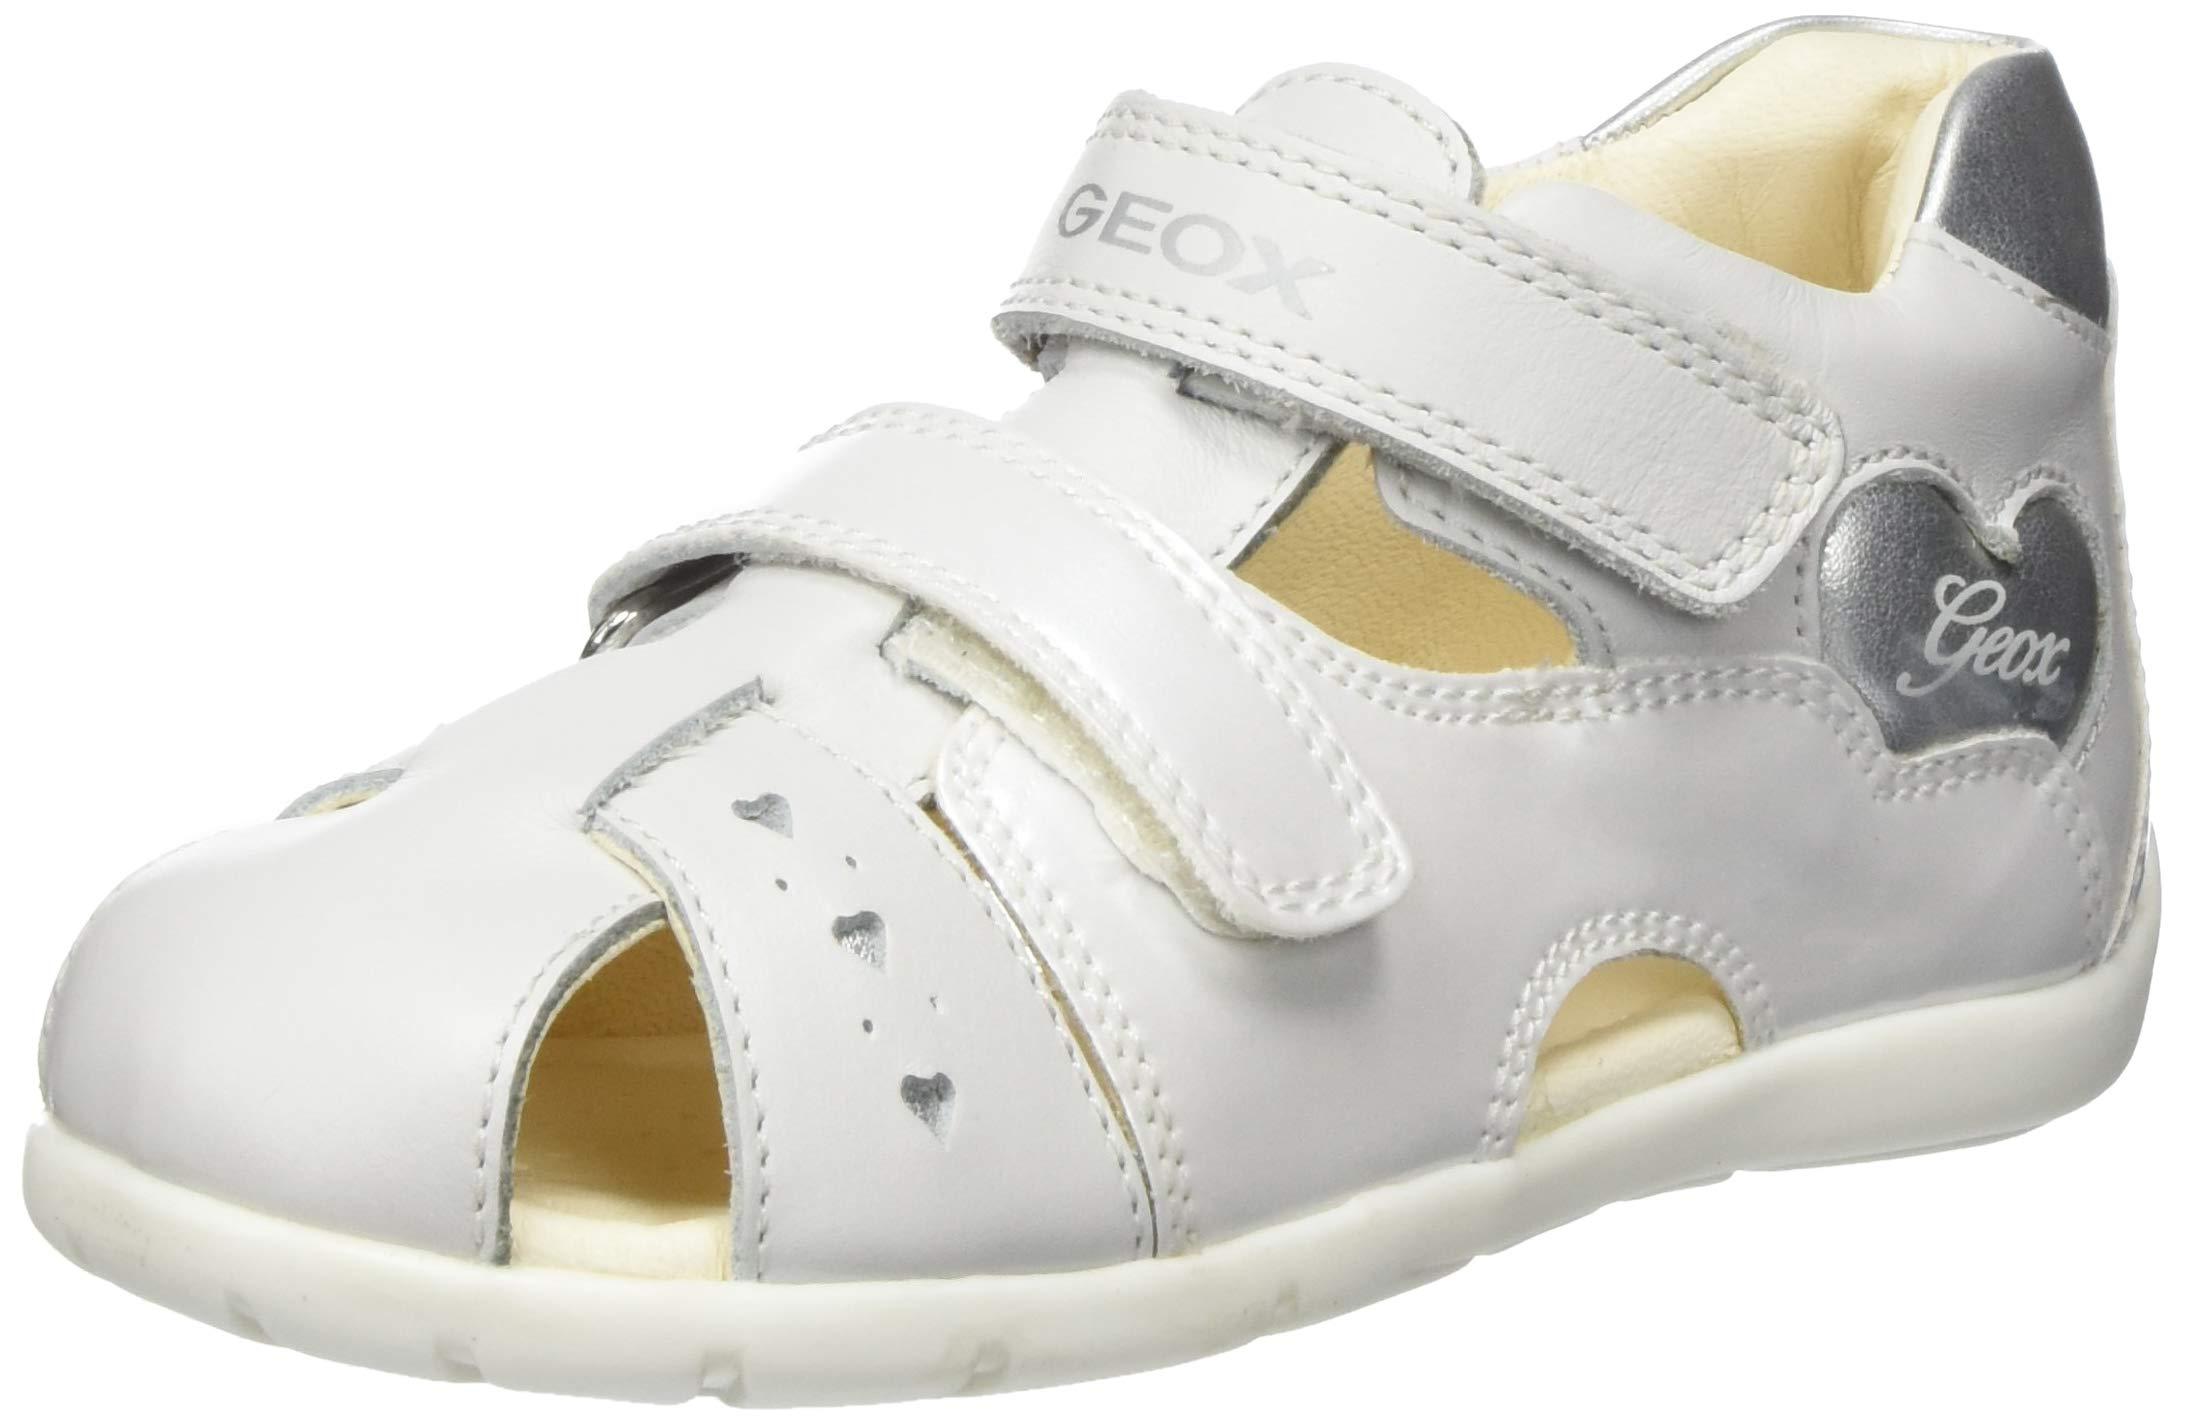 Geox Kids Baby Girl's Kaytan Girl 53 (Infant/Toddler) White/Silver